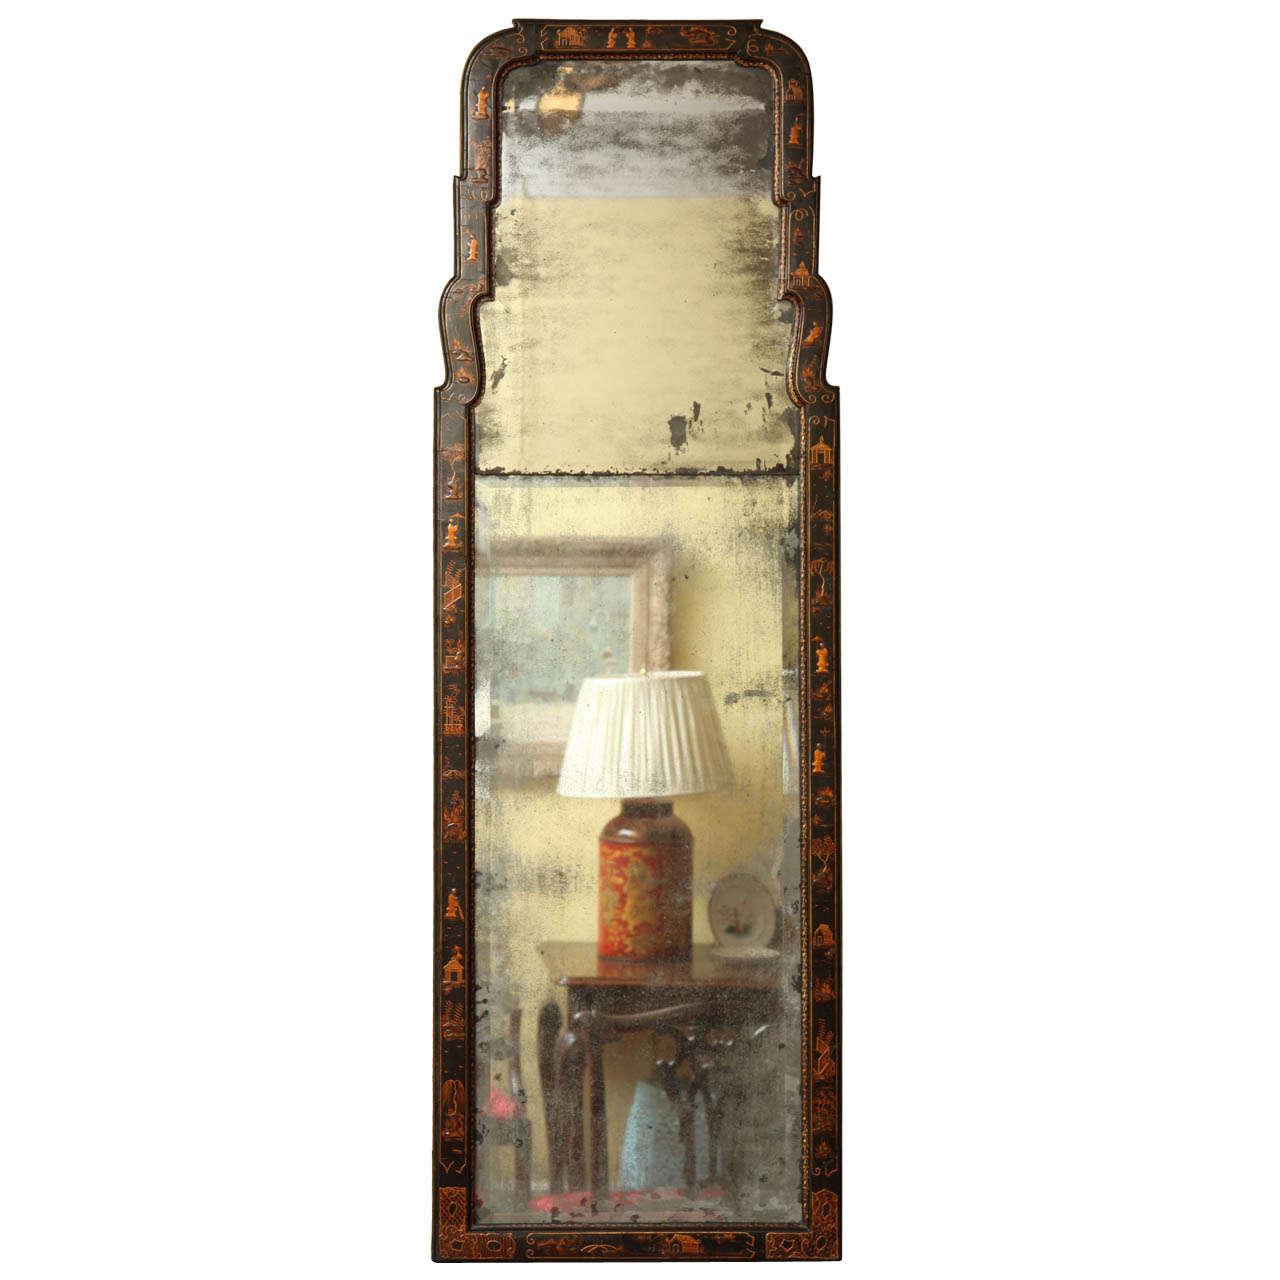 Queen Anne Period Japanned Pier Mirror, English, Circa 1715 For Sale